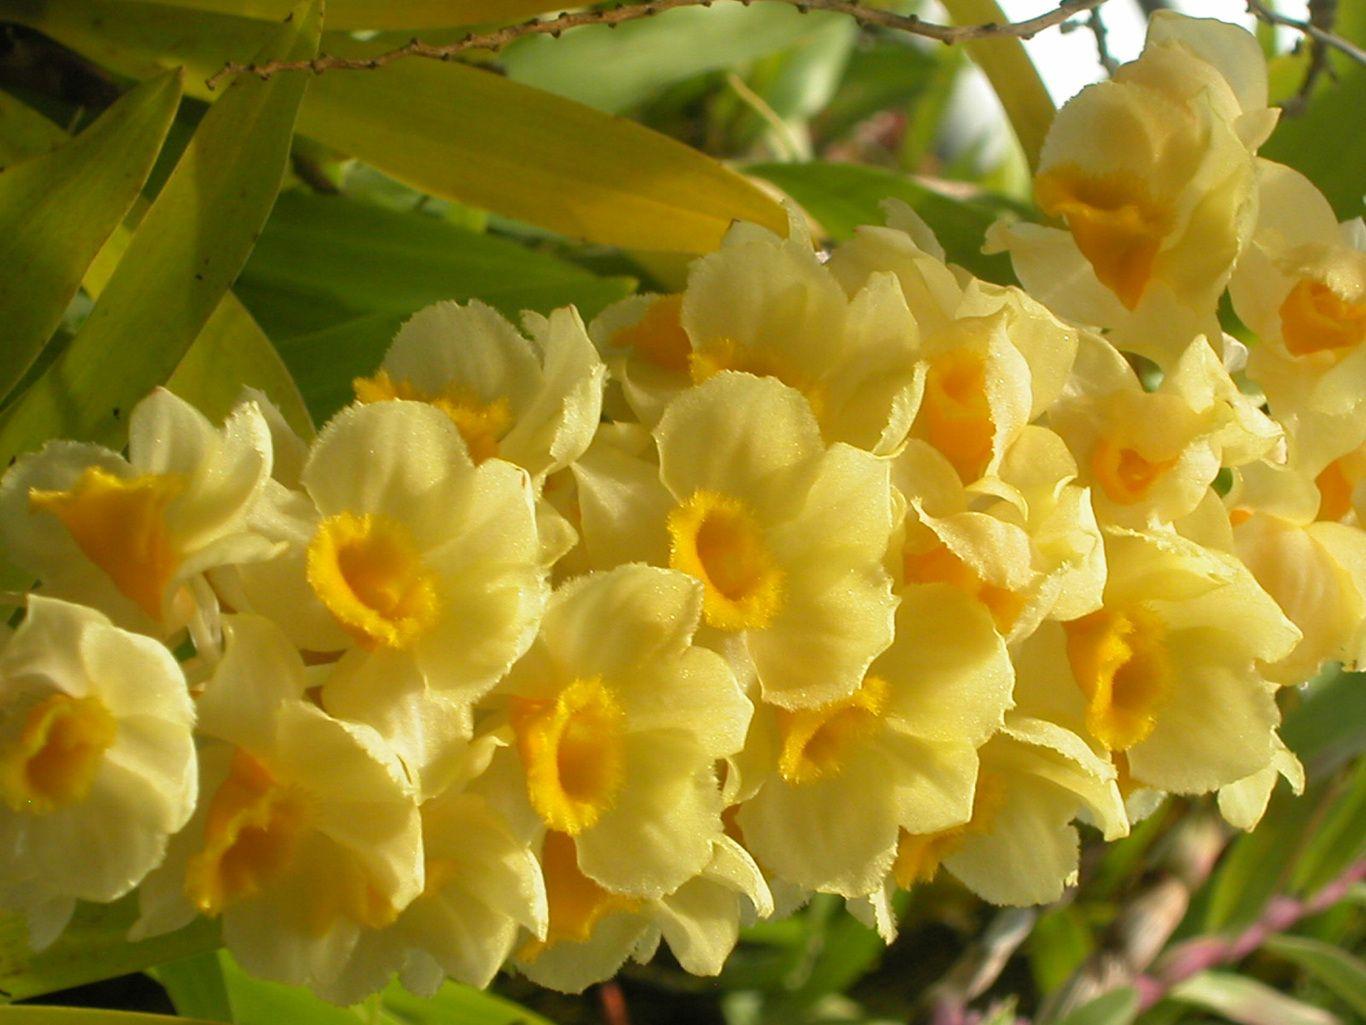 yellow flowers Google Search Yellow flower wallpaper